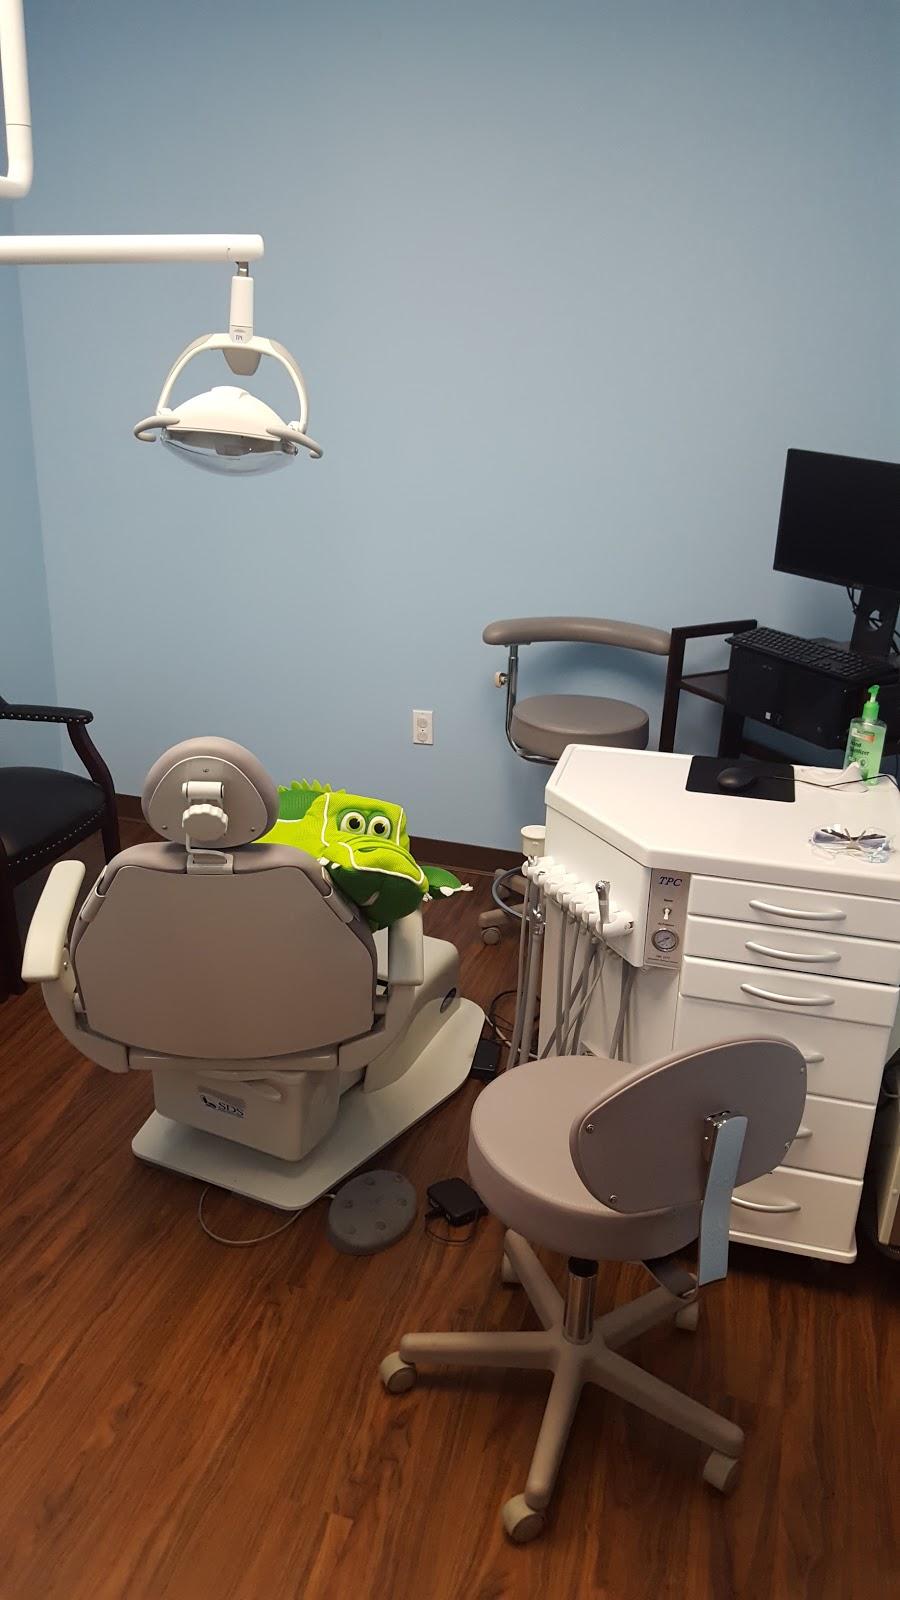 Grace Childrens Dentistry - dentist    Photo 6 of 9   Address: 6400 Holly Ave NE m, Albuquerque, NM 87113, USA   Phone: (505) 295-1942